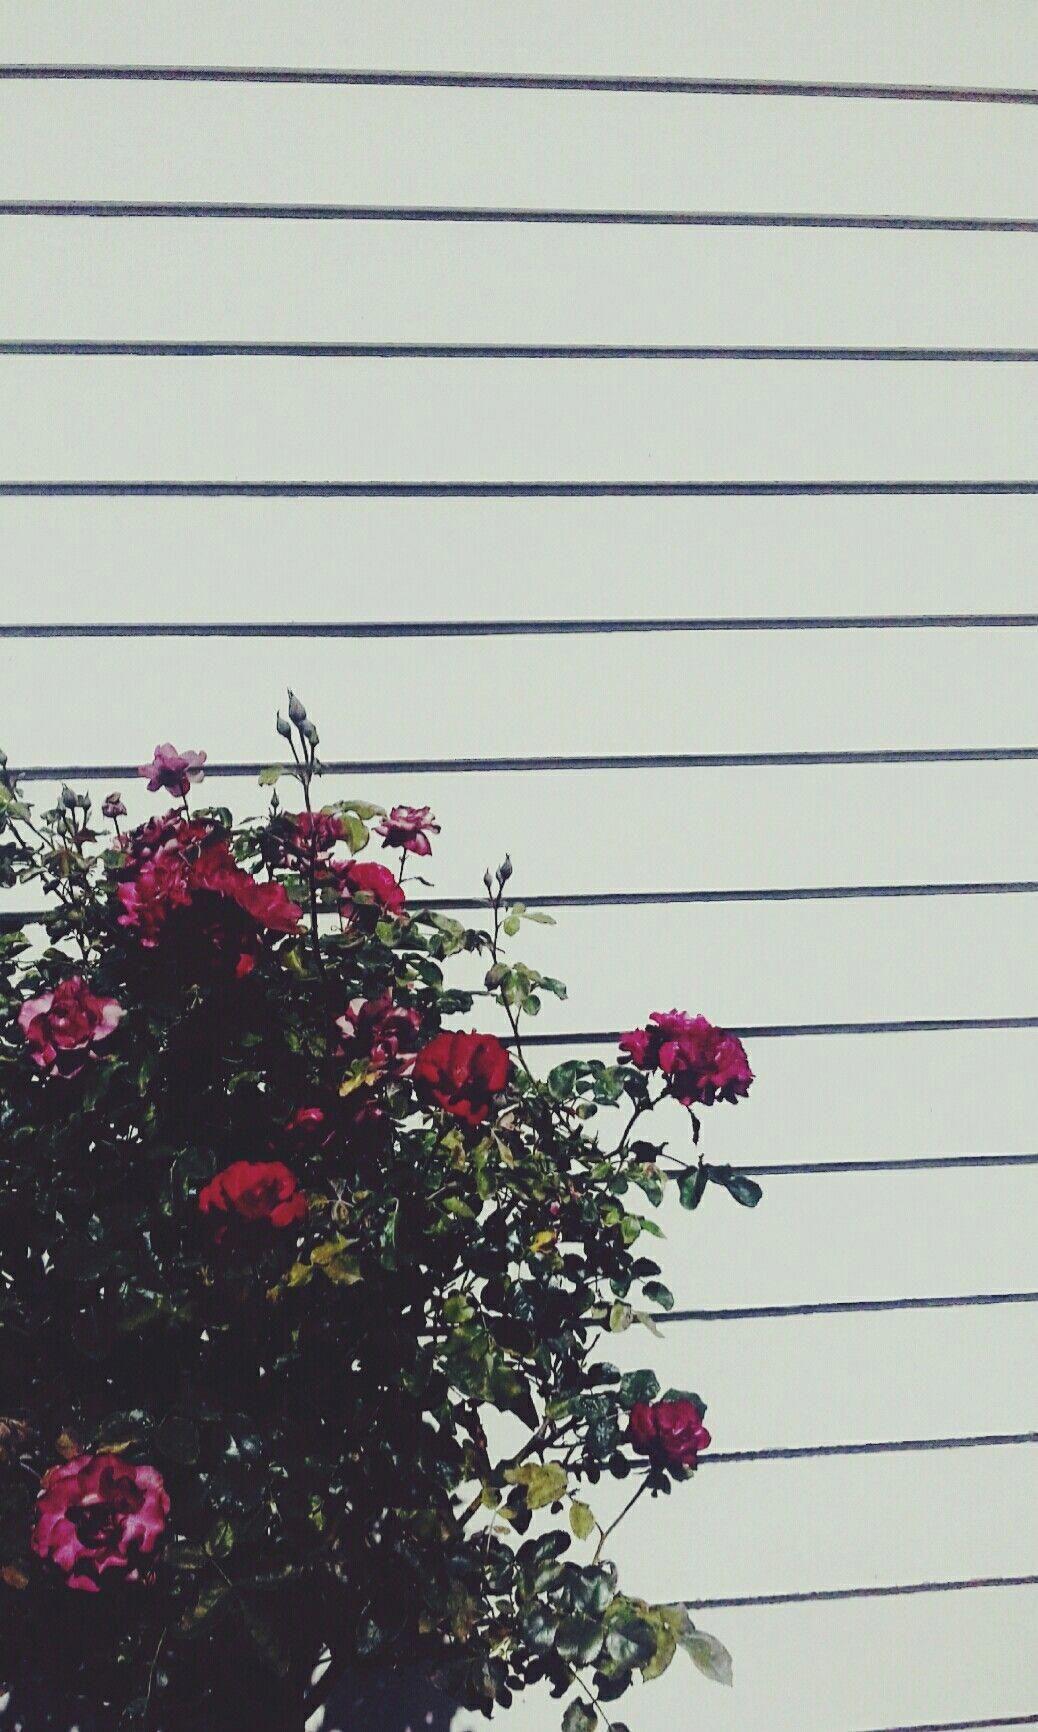 Grunge Tumblr Aesthetic Flower Wallpapers Top Free Grunge Tumblr Aesthetic Flower Backgrounds Wallpaperaccess